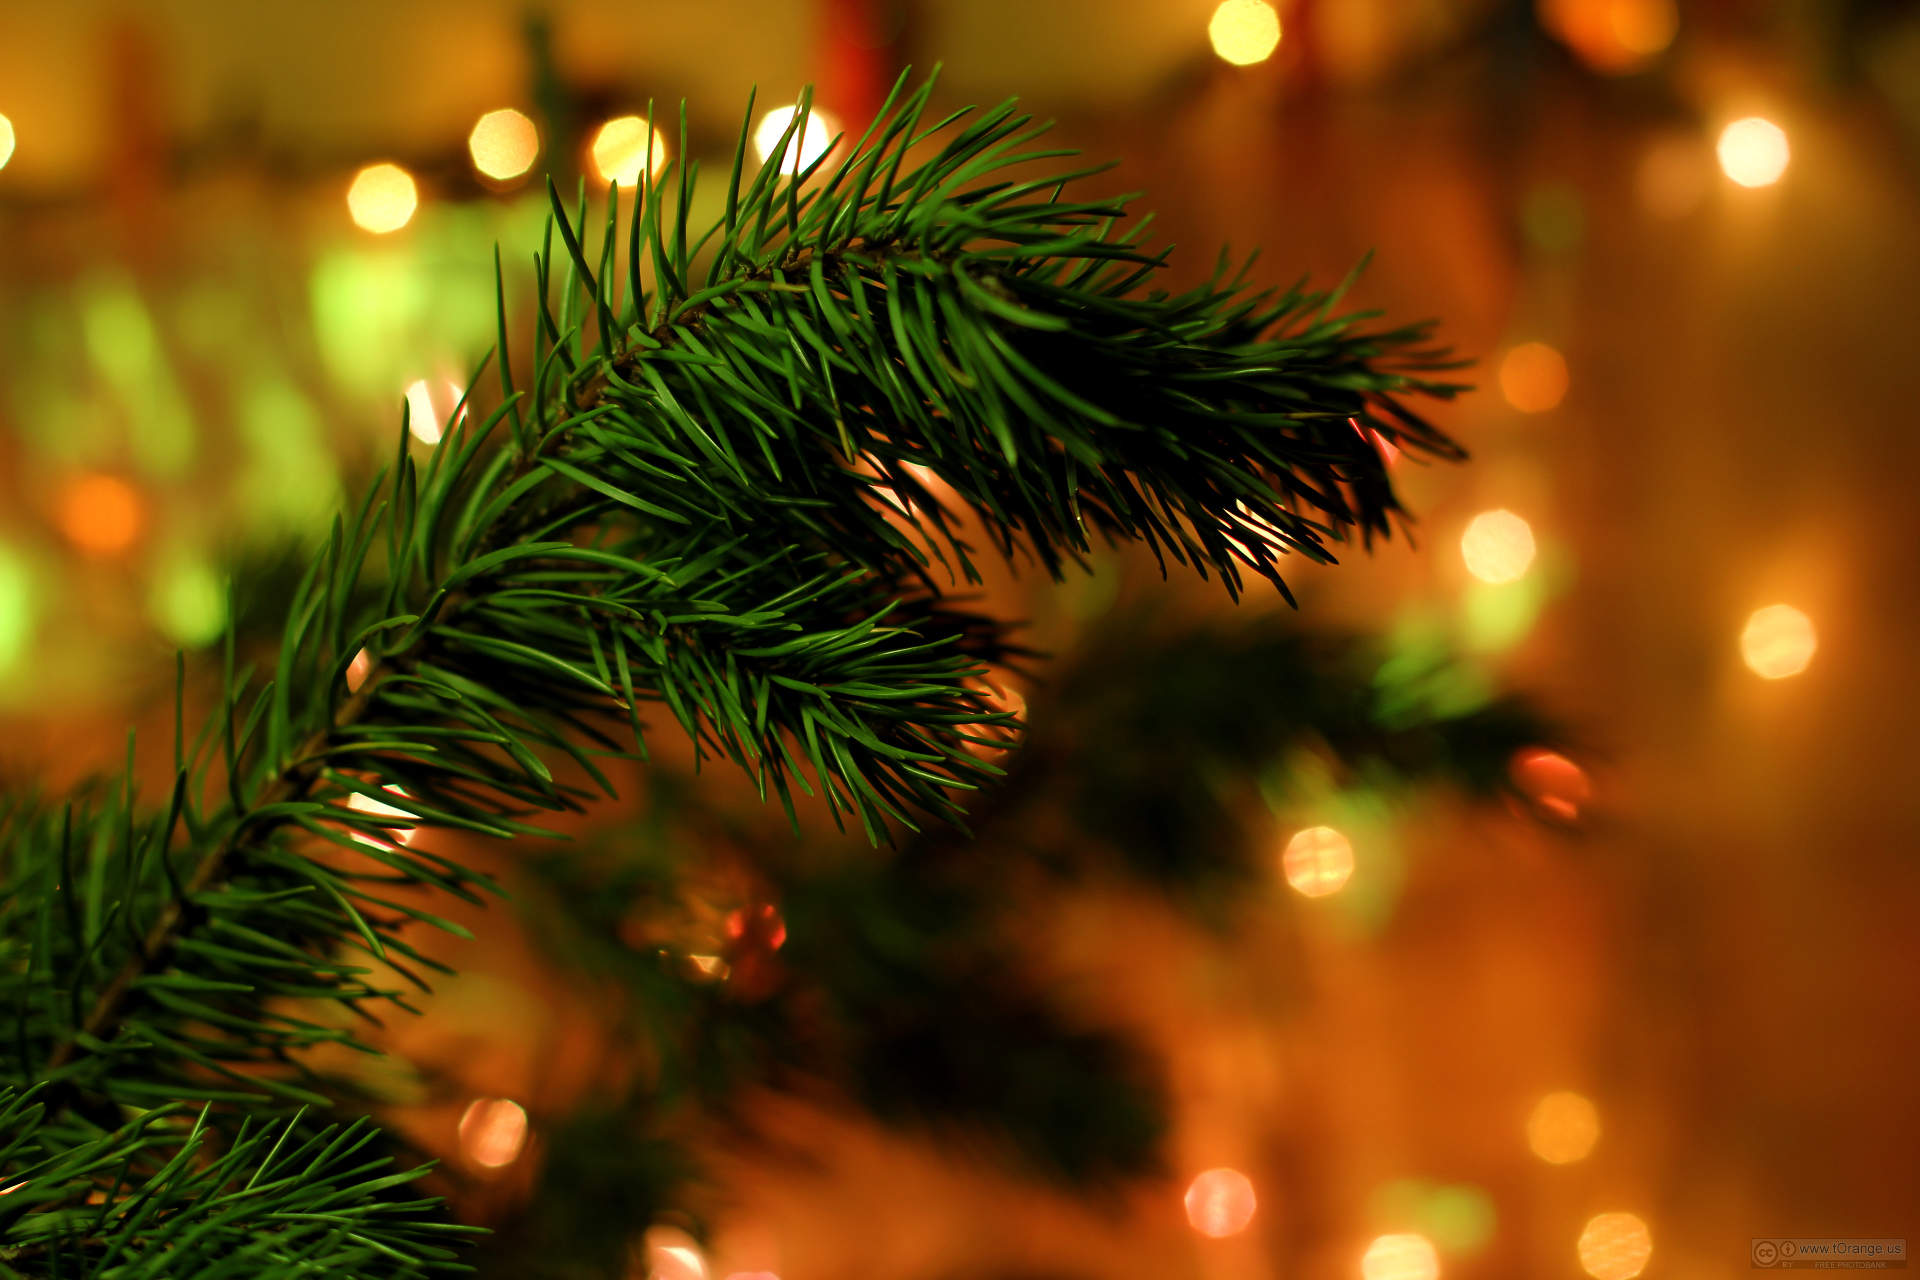 colorado country christmas gift show - Colorado Country Christmas